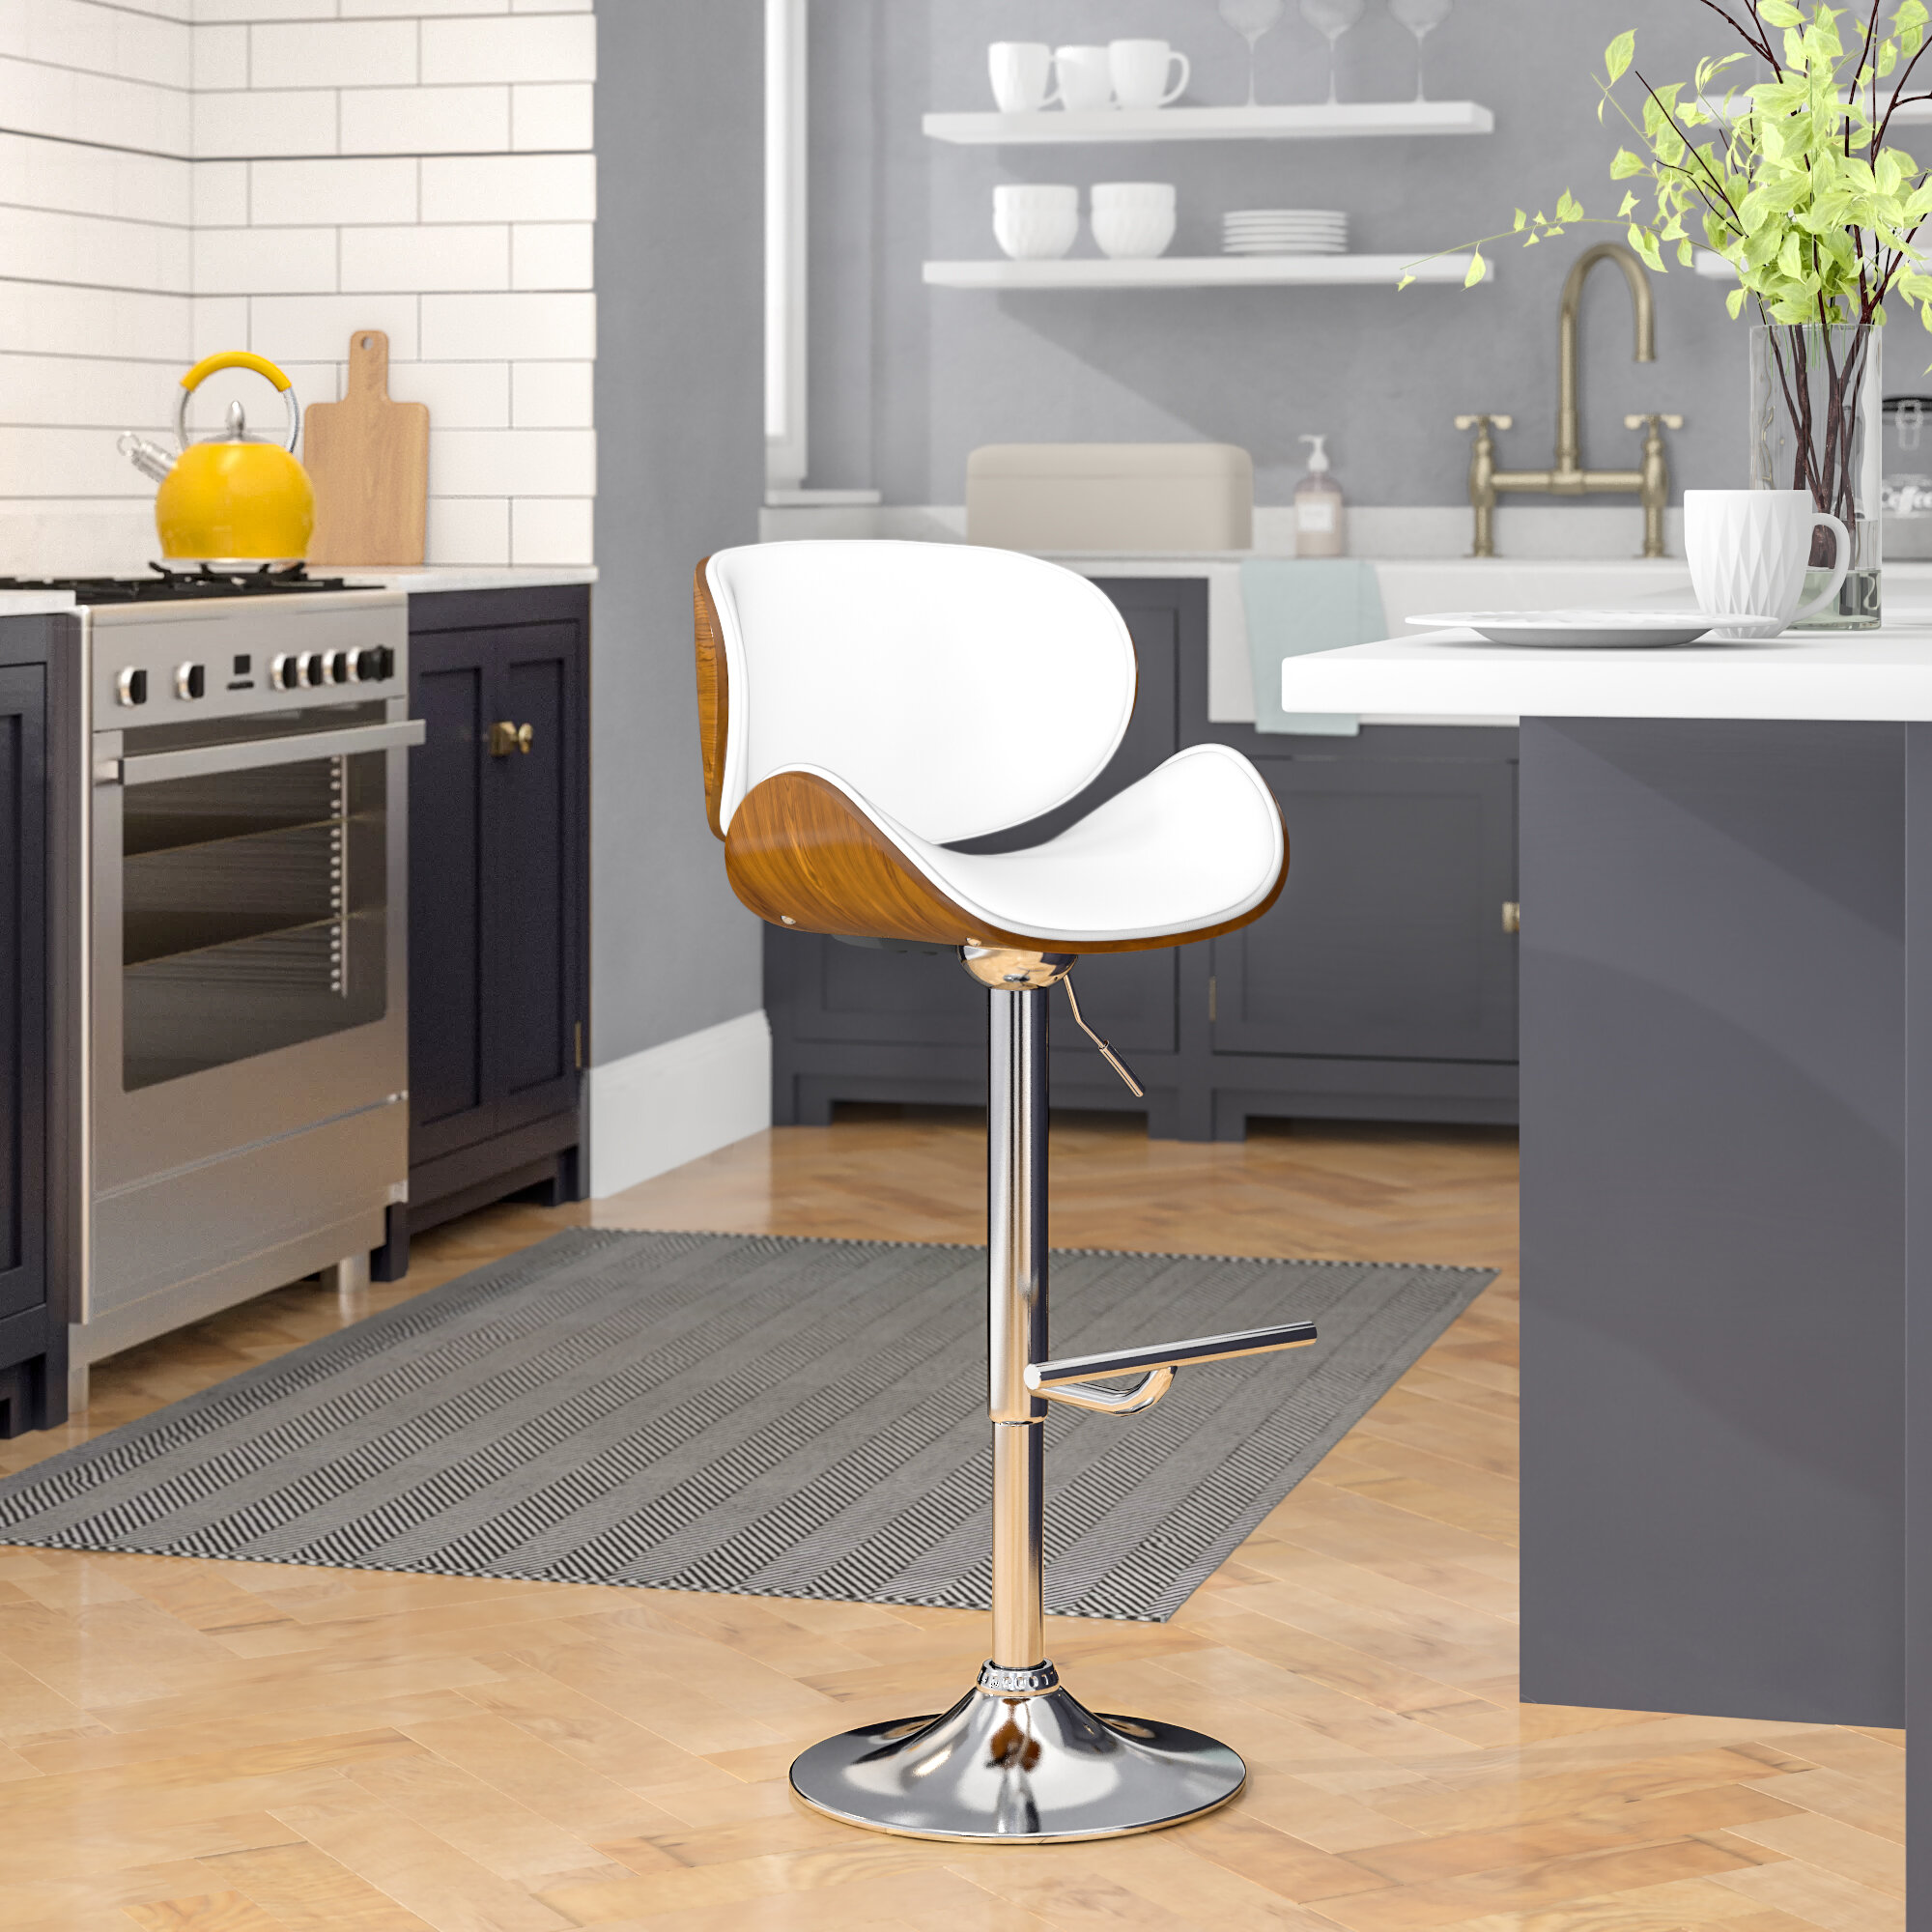 Miraculous Bissett Adjustable Height Swivel Bar Stool Beatyapartments Chair Design Images Beatyapartmentscom